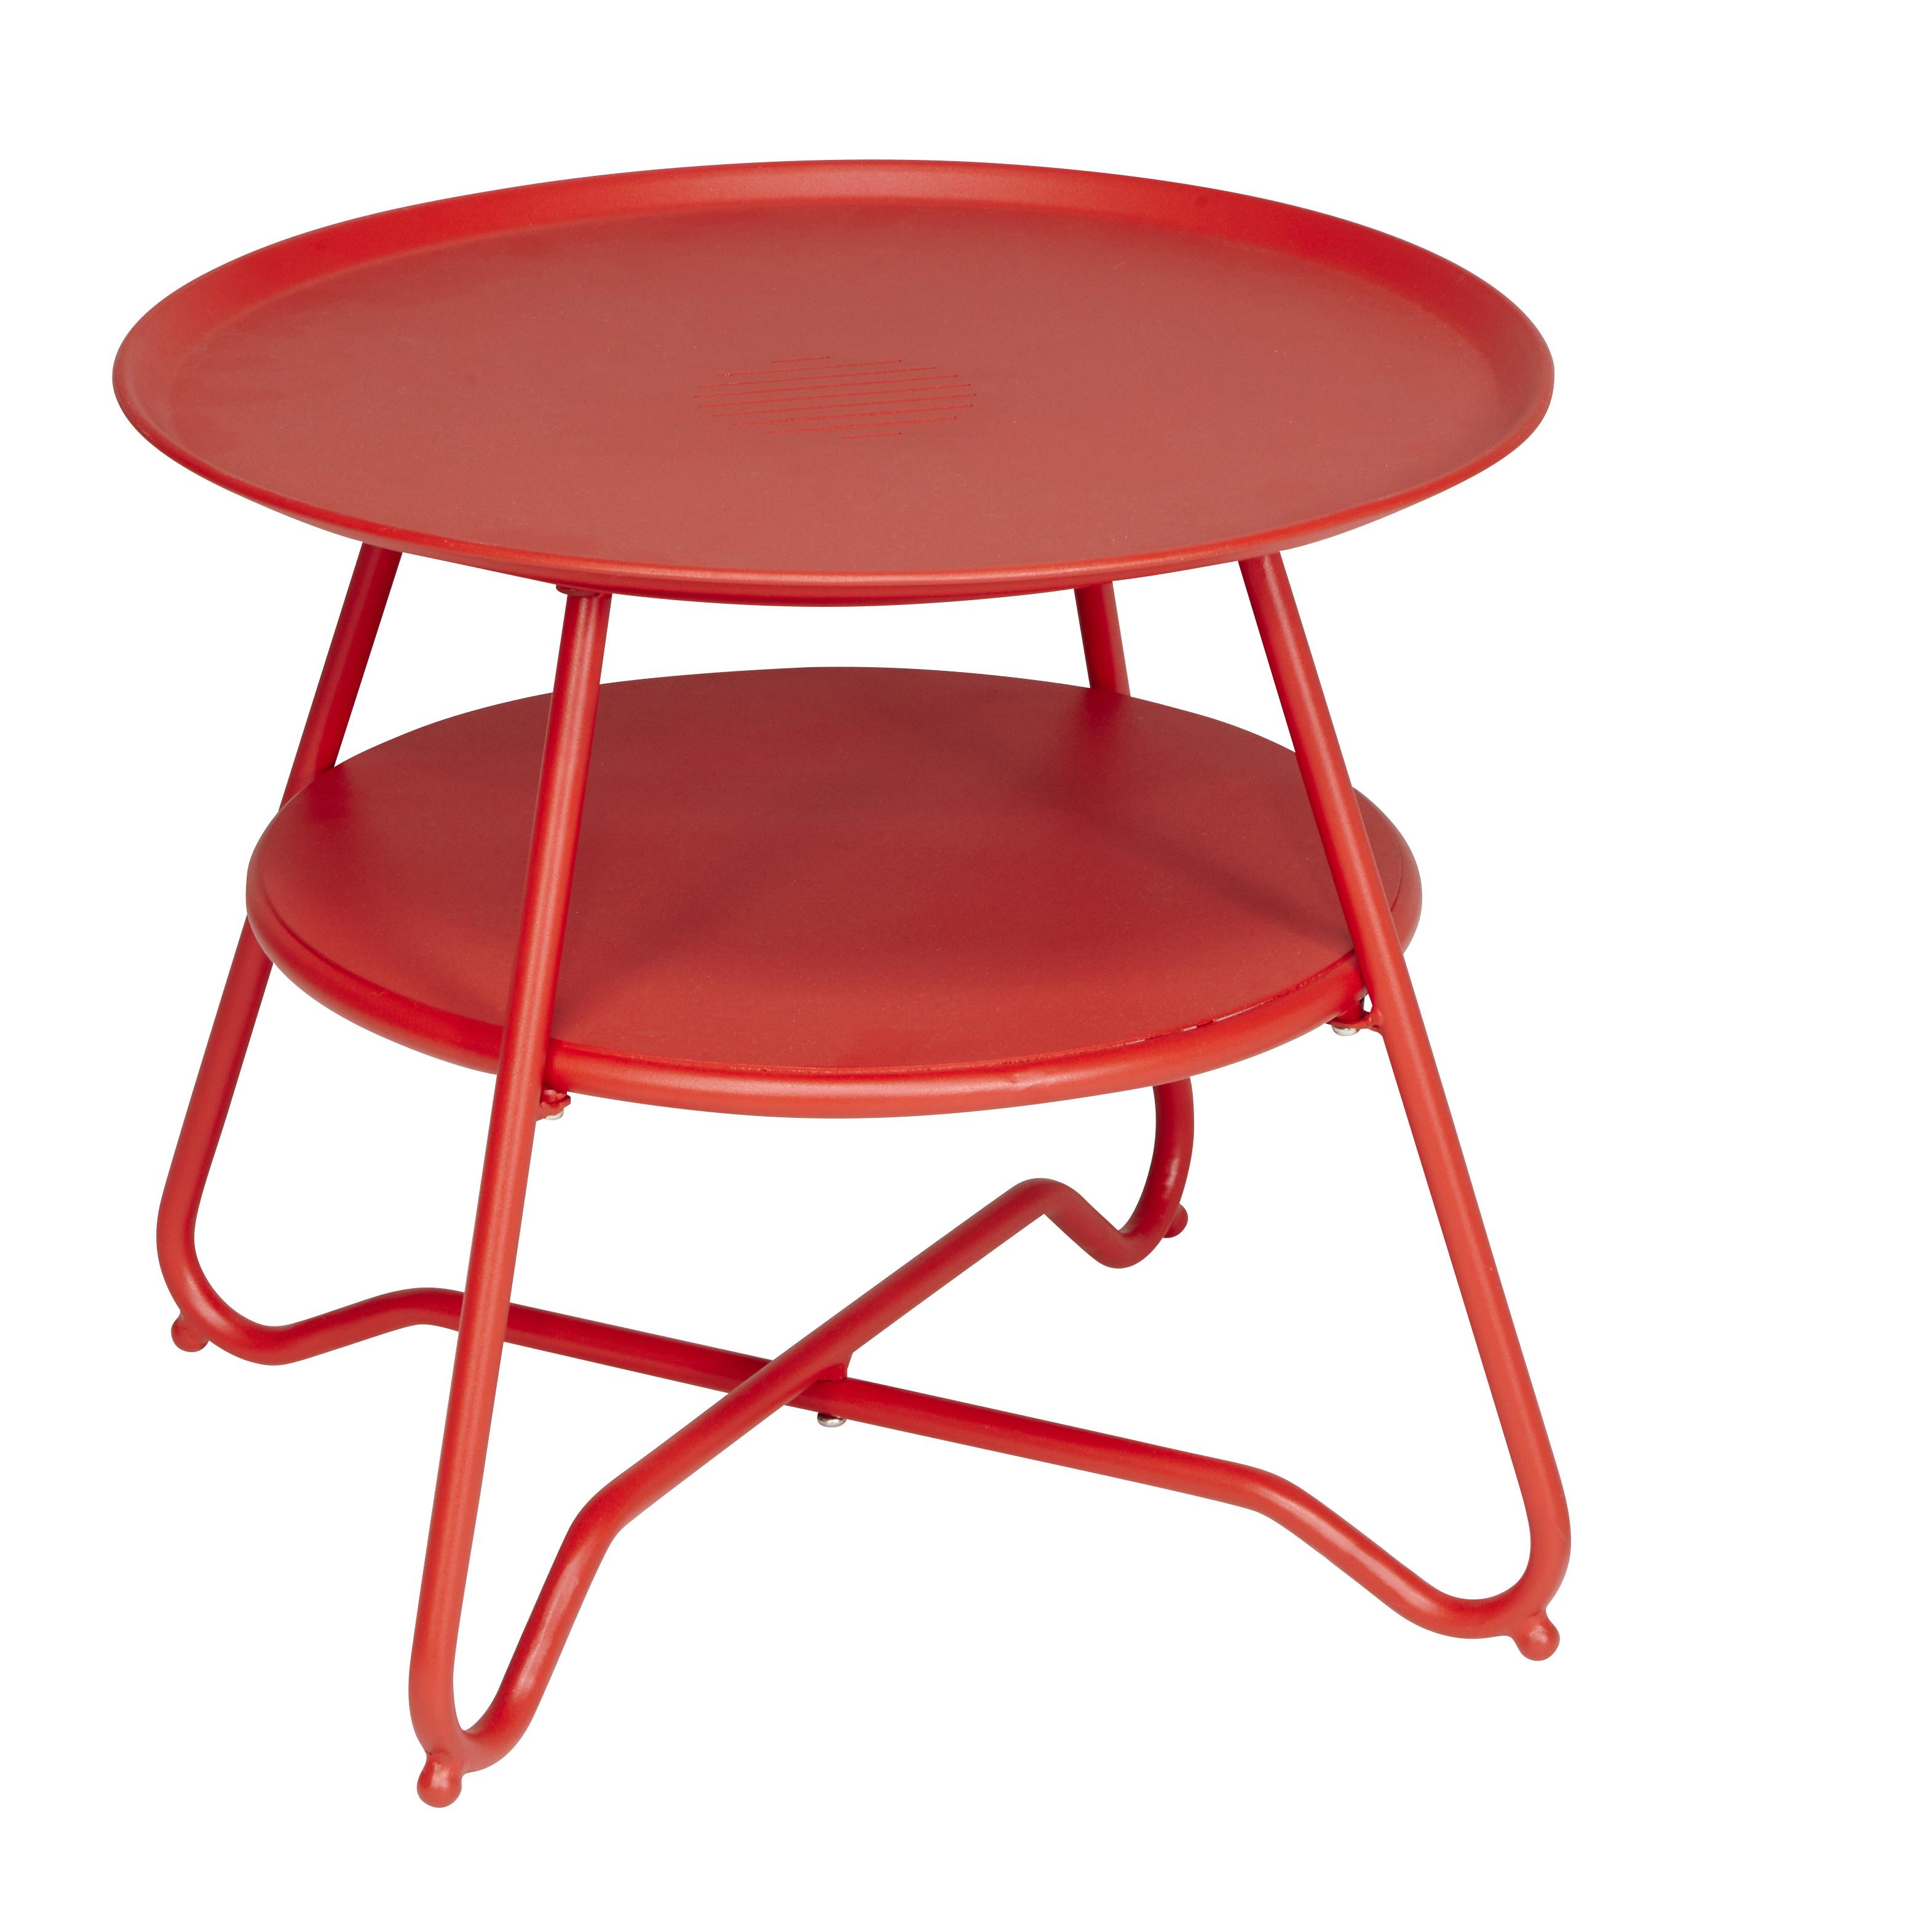 Hyba Table Basse De Jardin Alu 151 Rouge Pas Cher Achat  # Table De Jardin Hyba